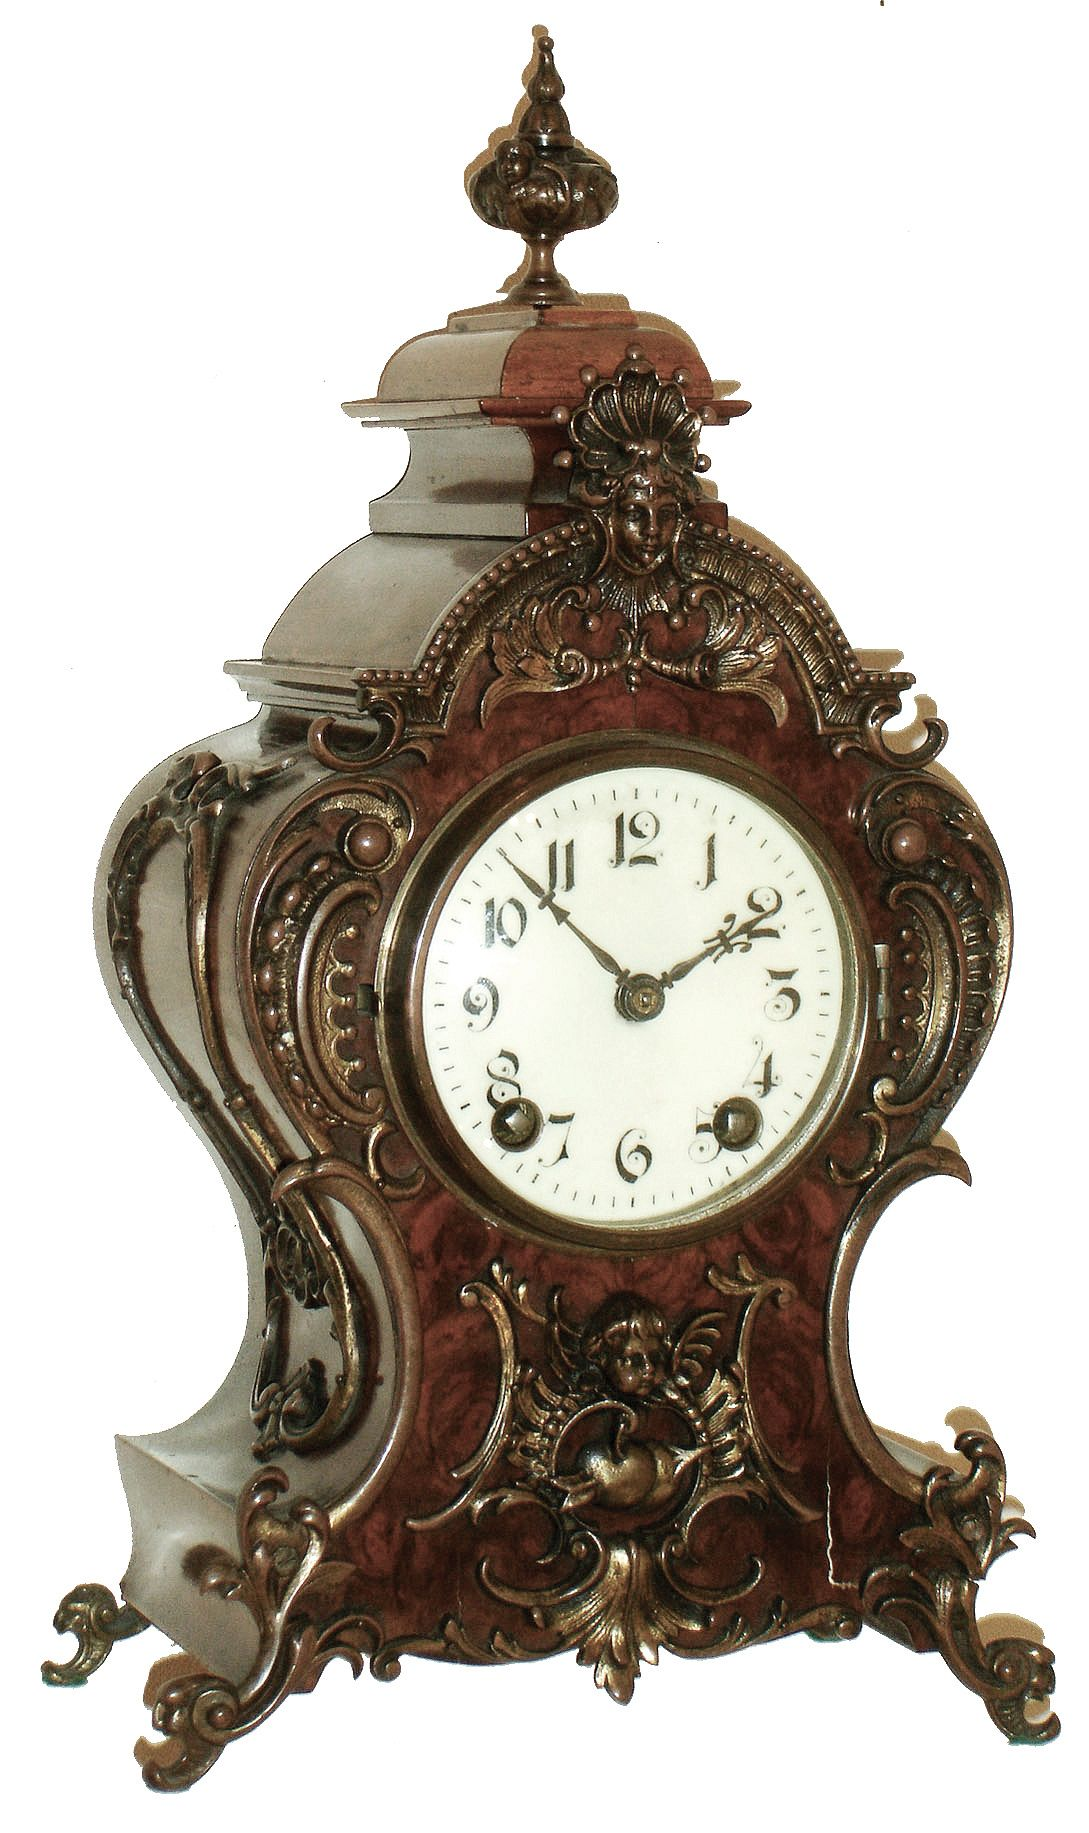 13125 A Jpg Obraz Jpeg 1089 1833 Pikseli Skala 34 Antique Clocks Antique Clock Mantel Clocks